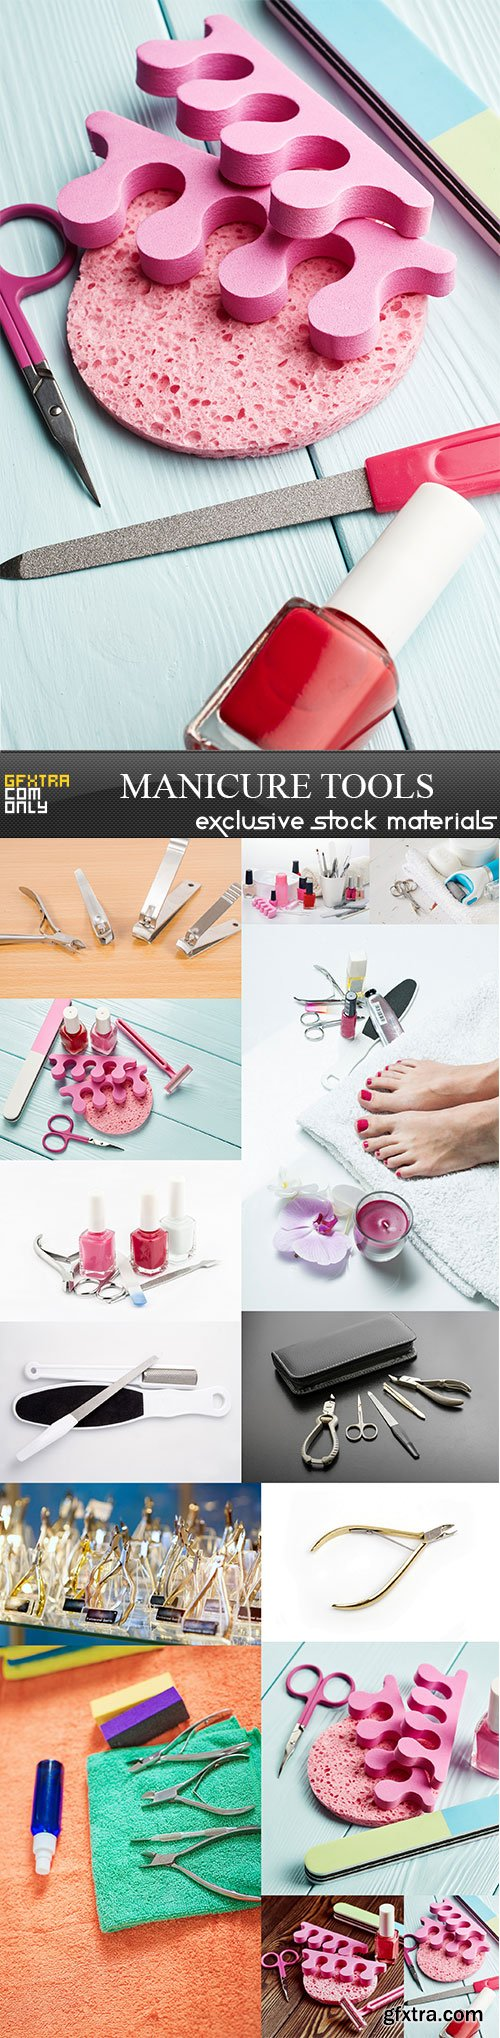 Manicure tools, 14 x UHQ JPEG